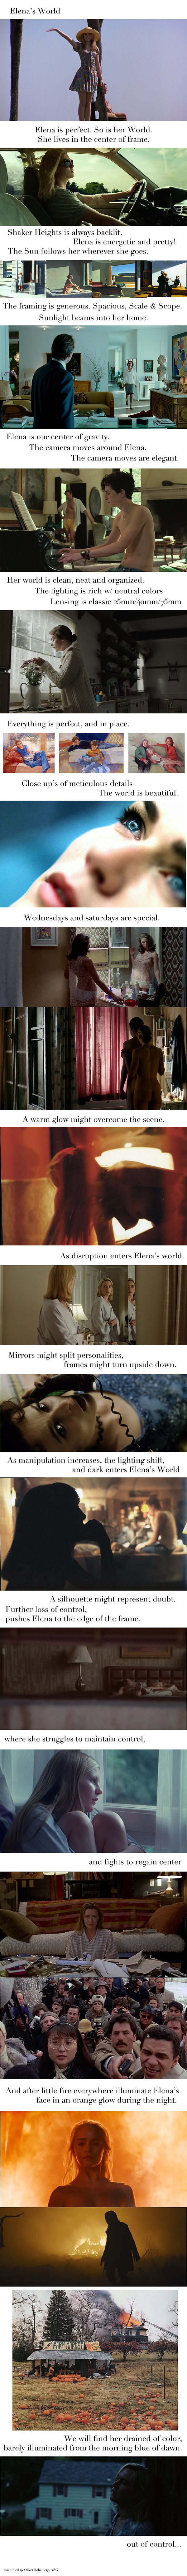 elena's world 2.1 copy.jpg